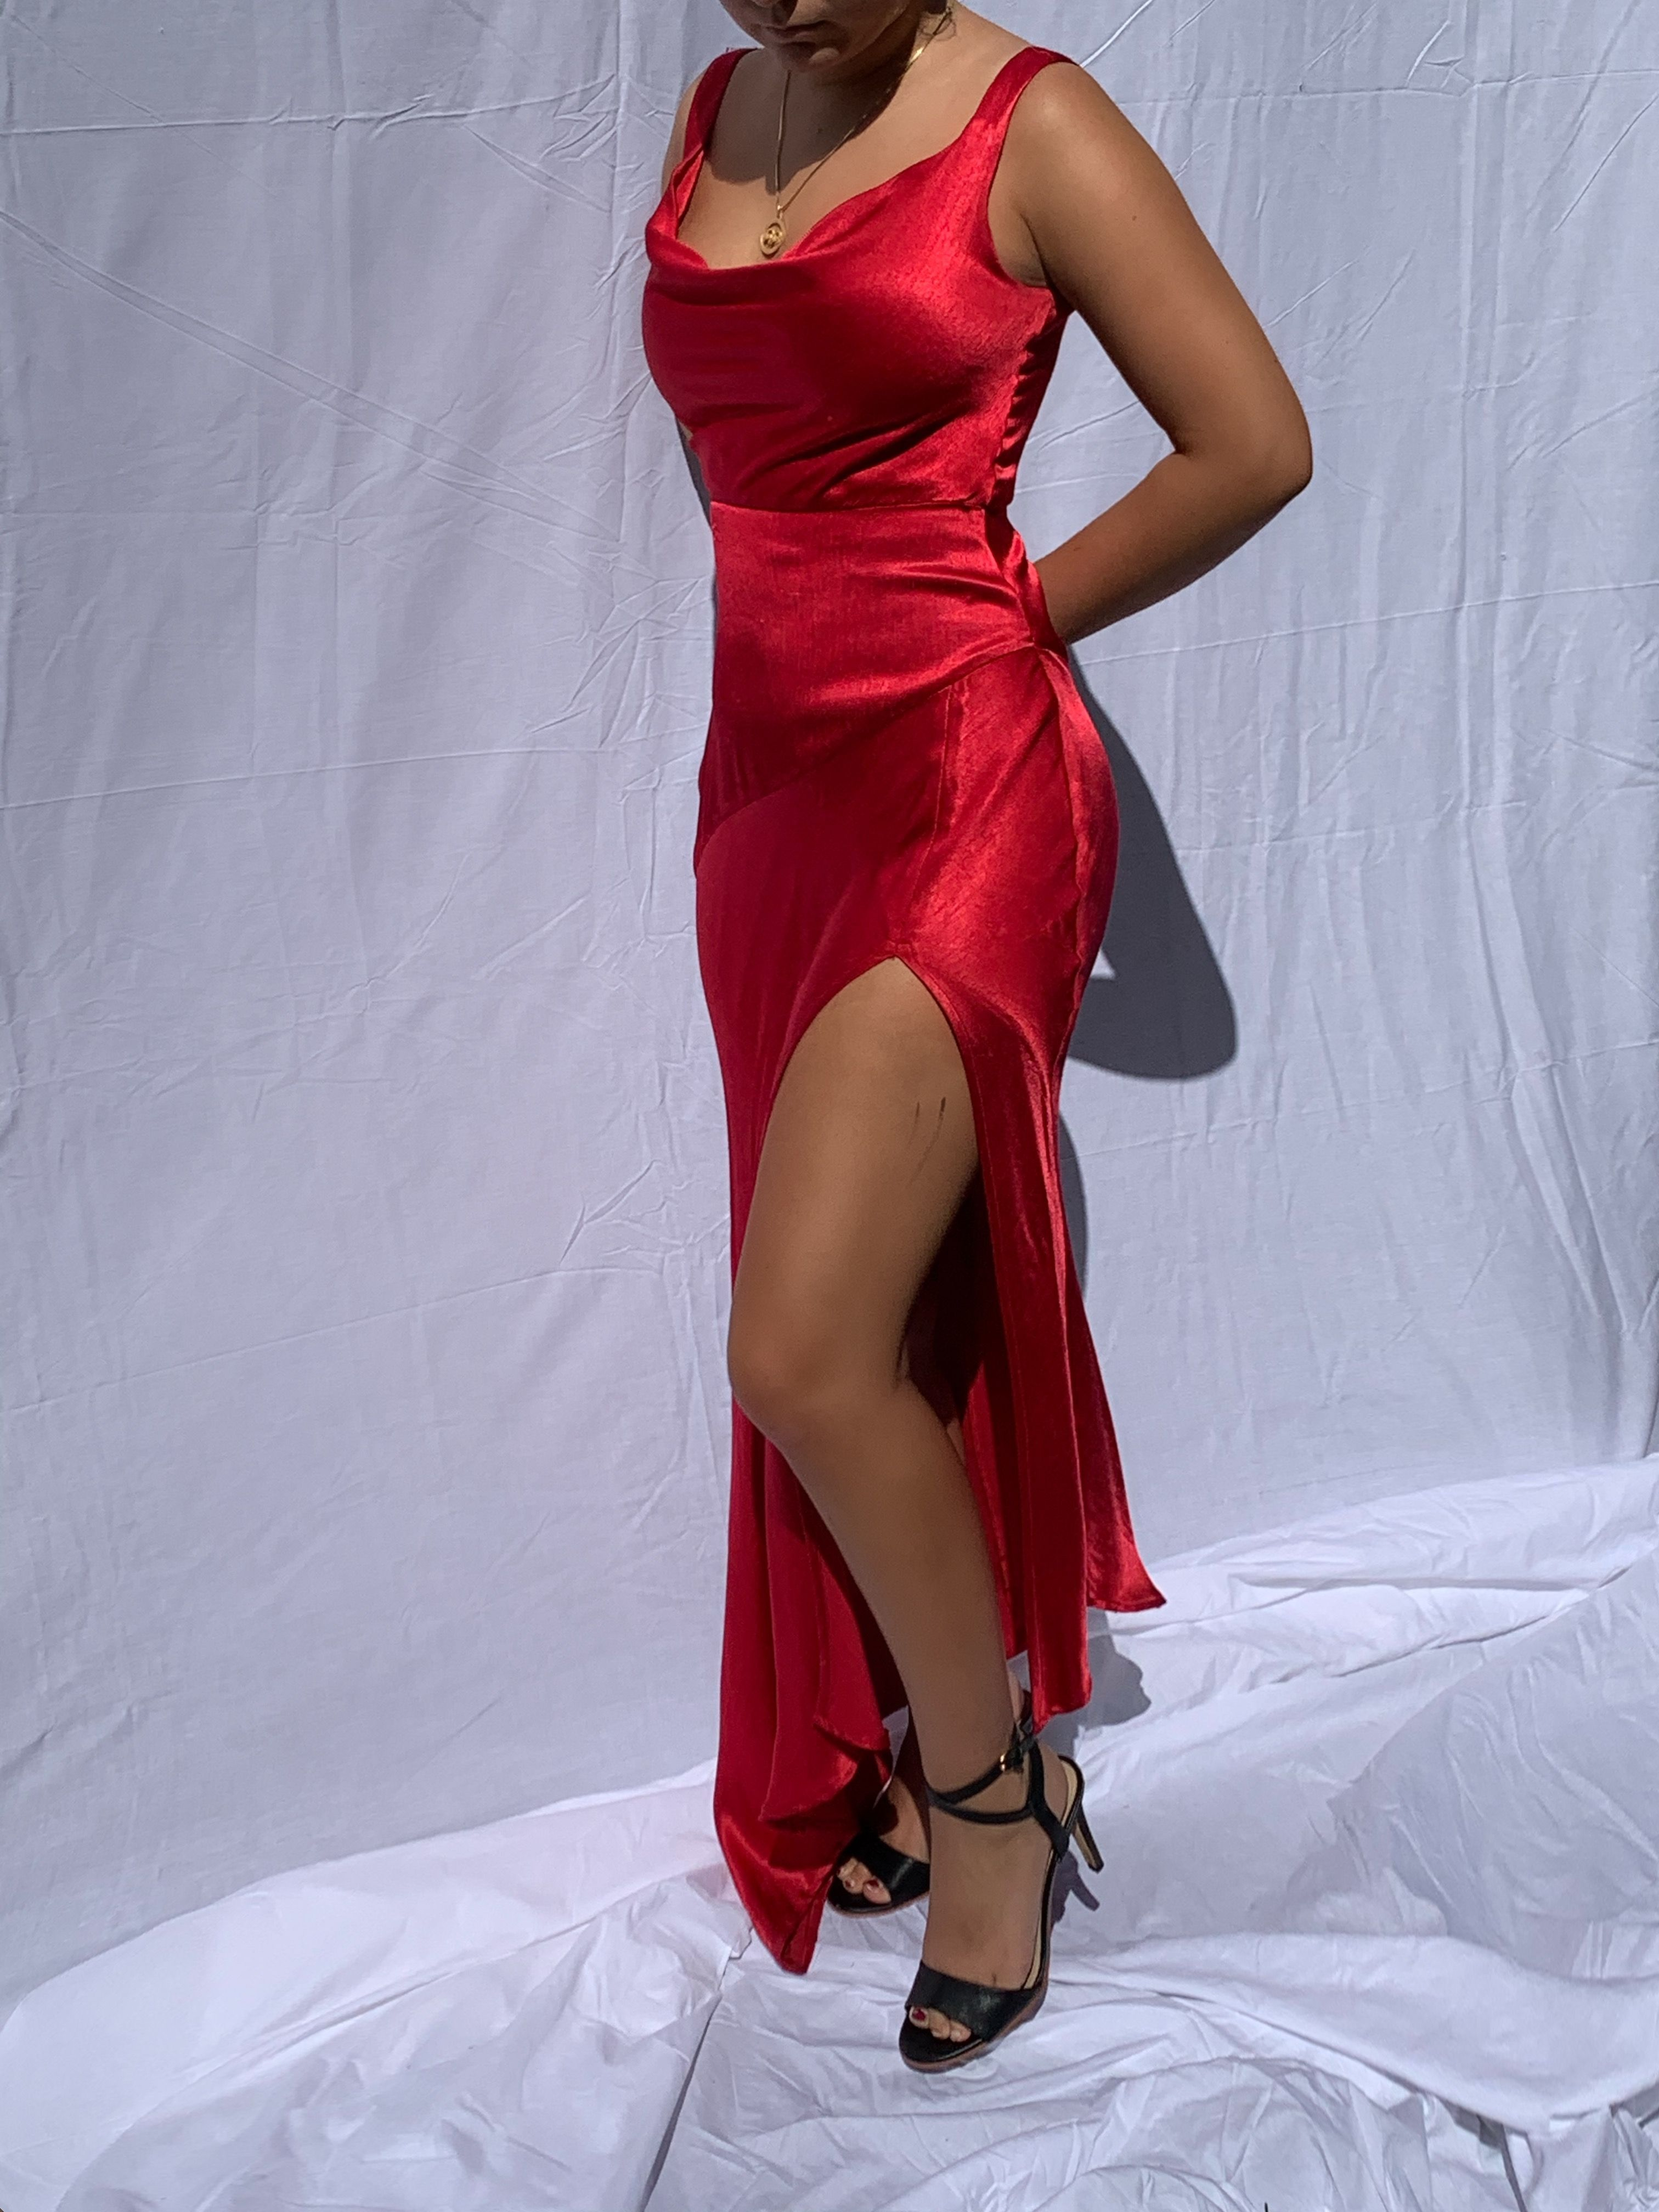 Buffy Vintage 90s Formal Dress Prom 2000s Y2k Red Silk Dress Silk Dress 90s Formal Dress Formal Dresses Formal Dresses Prom [ 4032 x 3024 Pixel ]